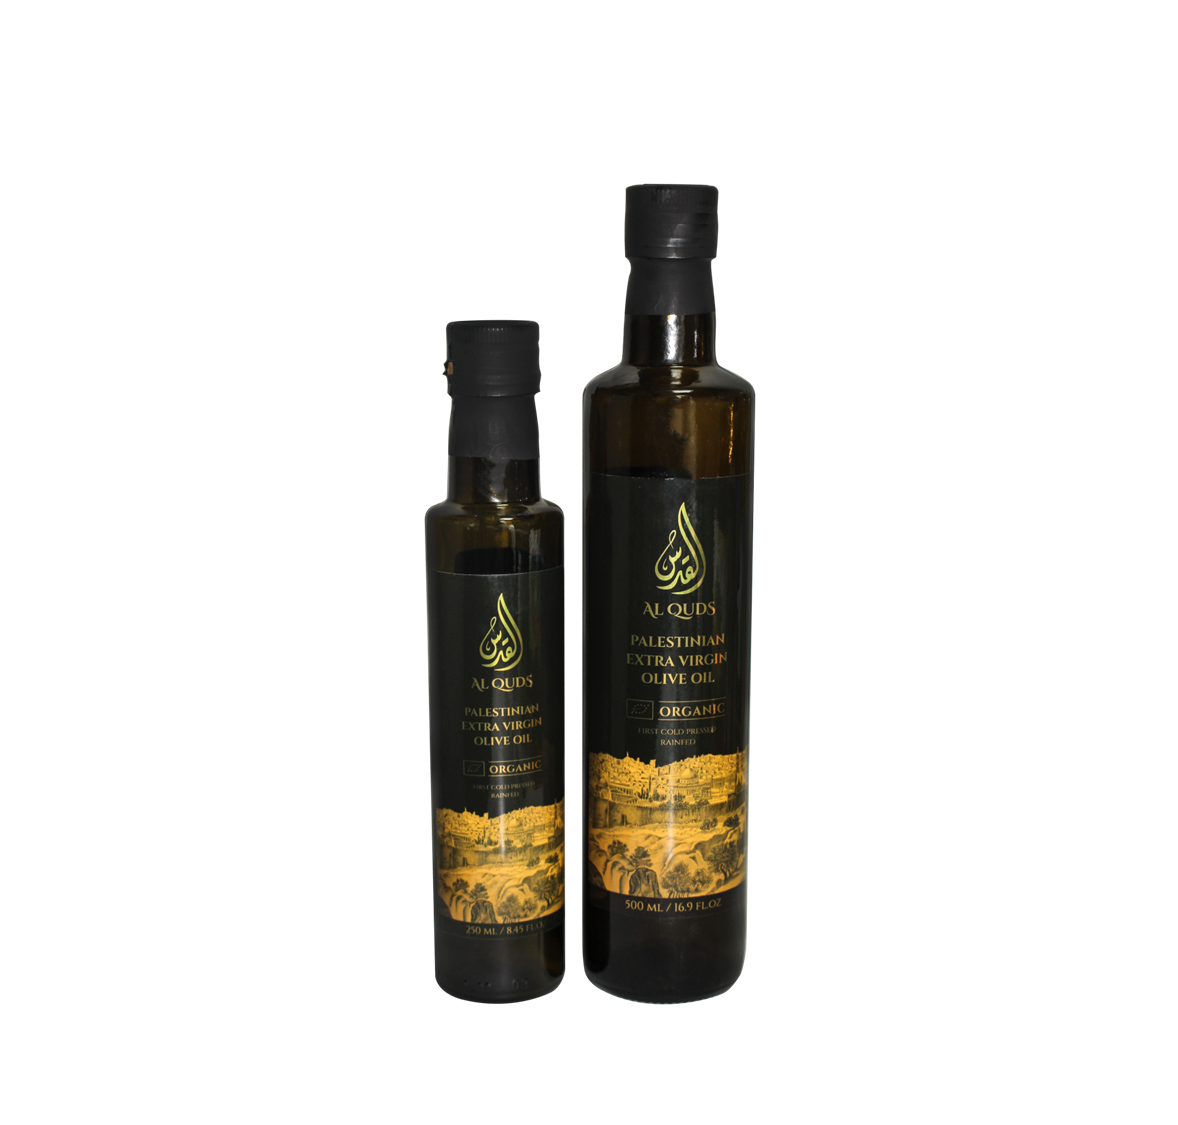 Al Quds Organic Extra Virgin Olive Oil